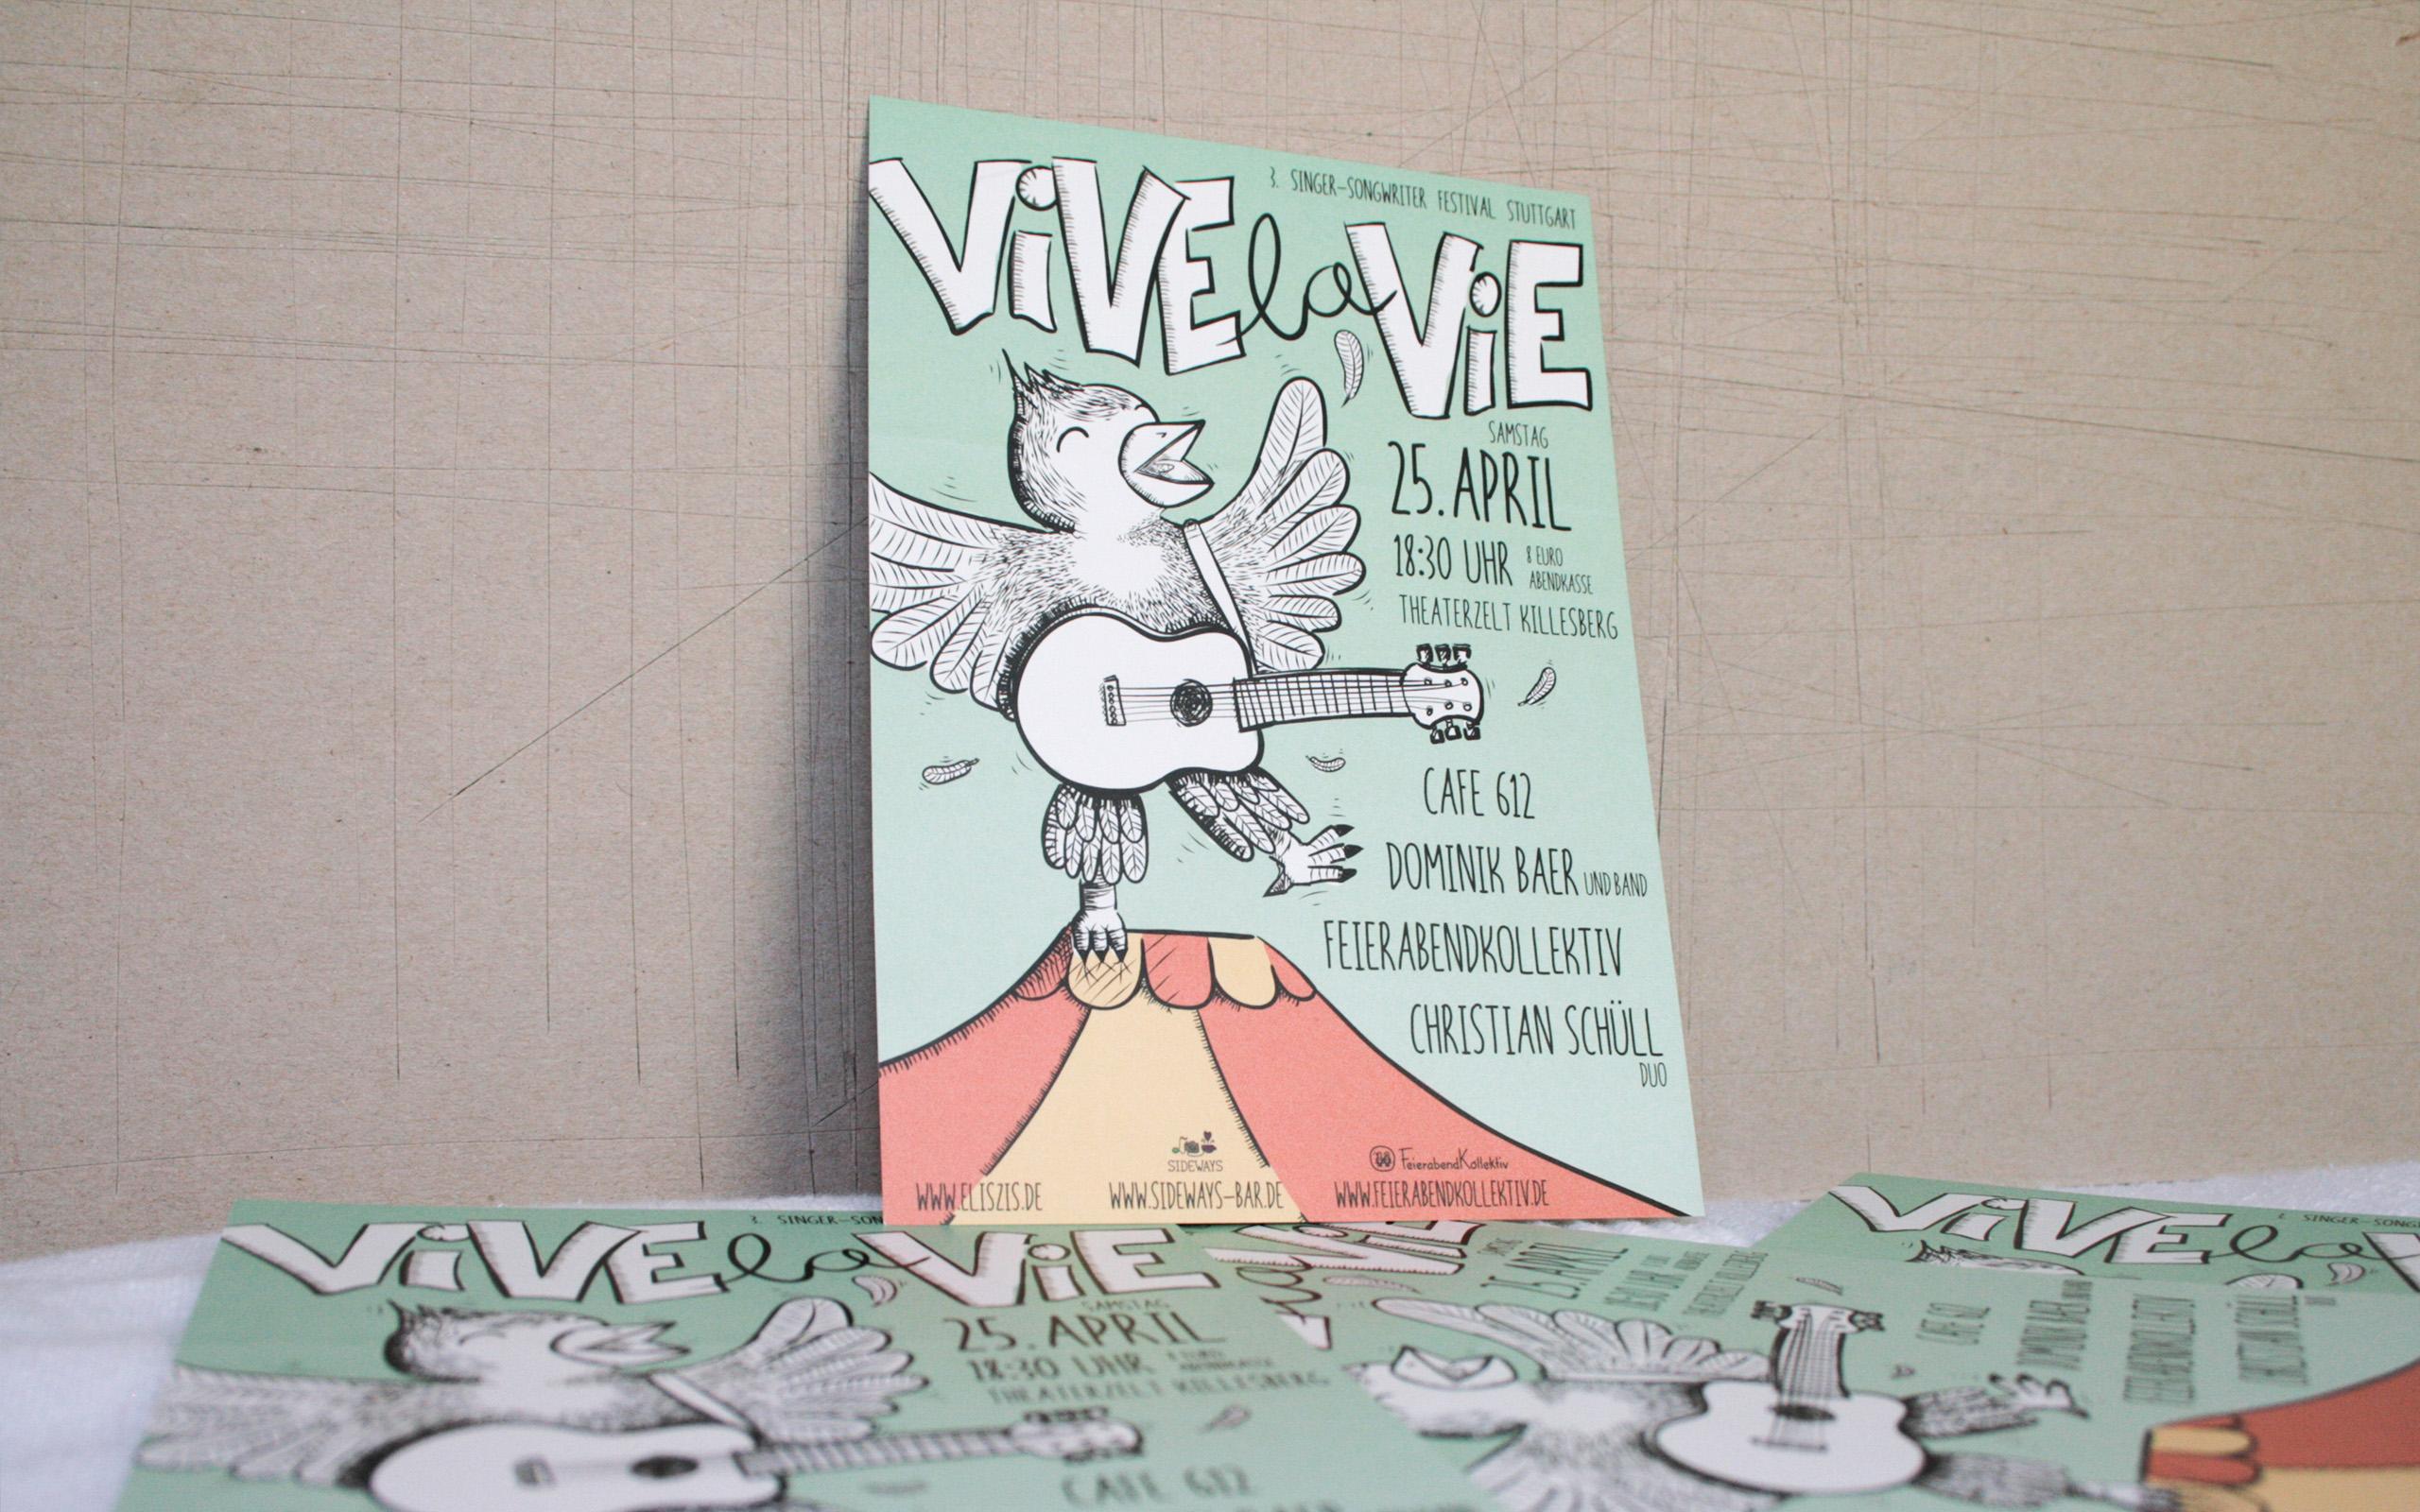 Vive la Vie Plakat 2015 Nahaufnahme